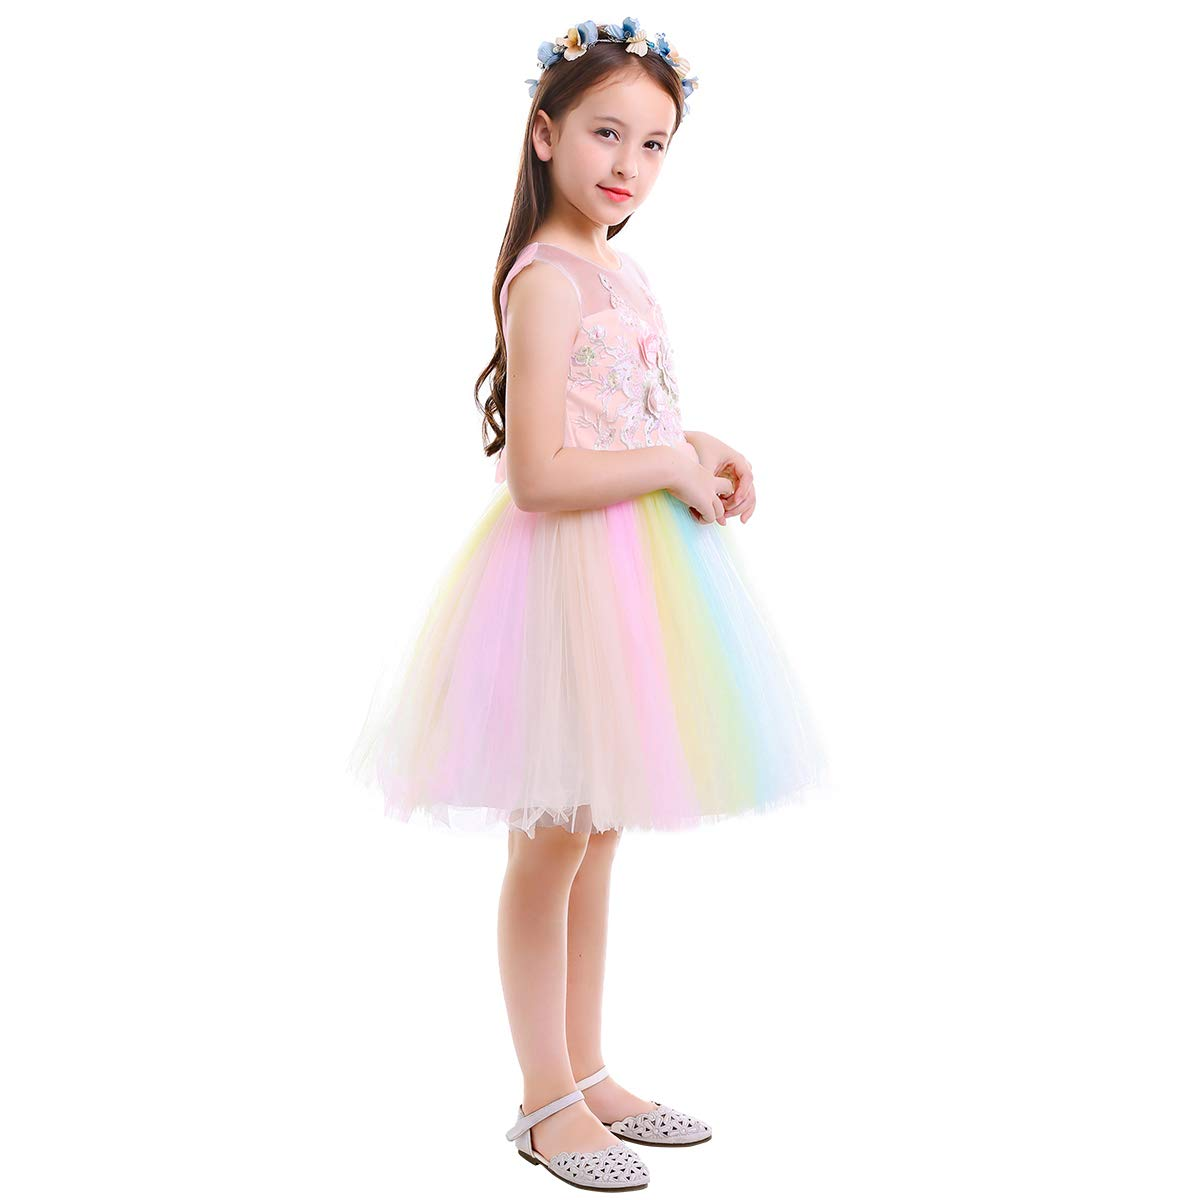 IMEKIS Flower Girls Unicorn Rainbow Dress Embroidery Floral Birthday Party Gown